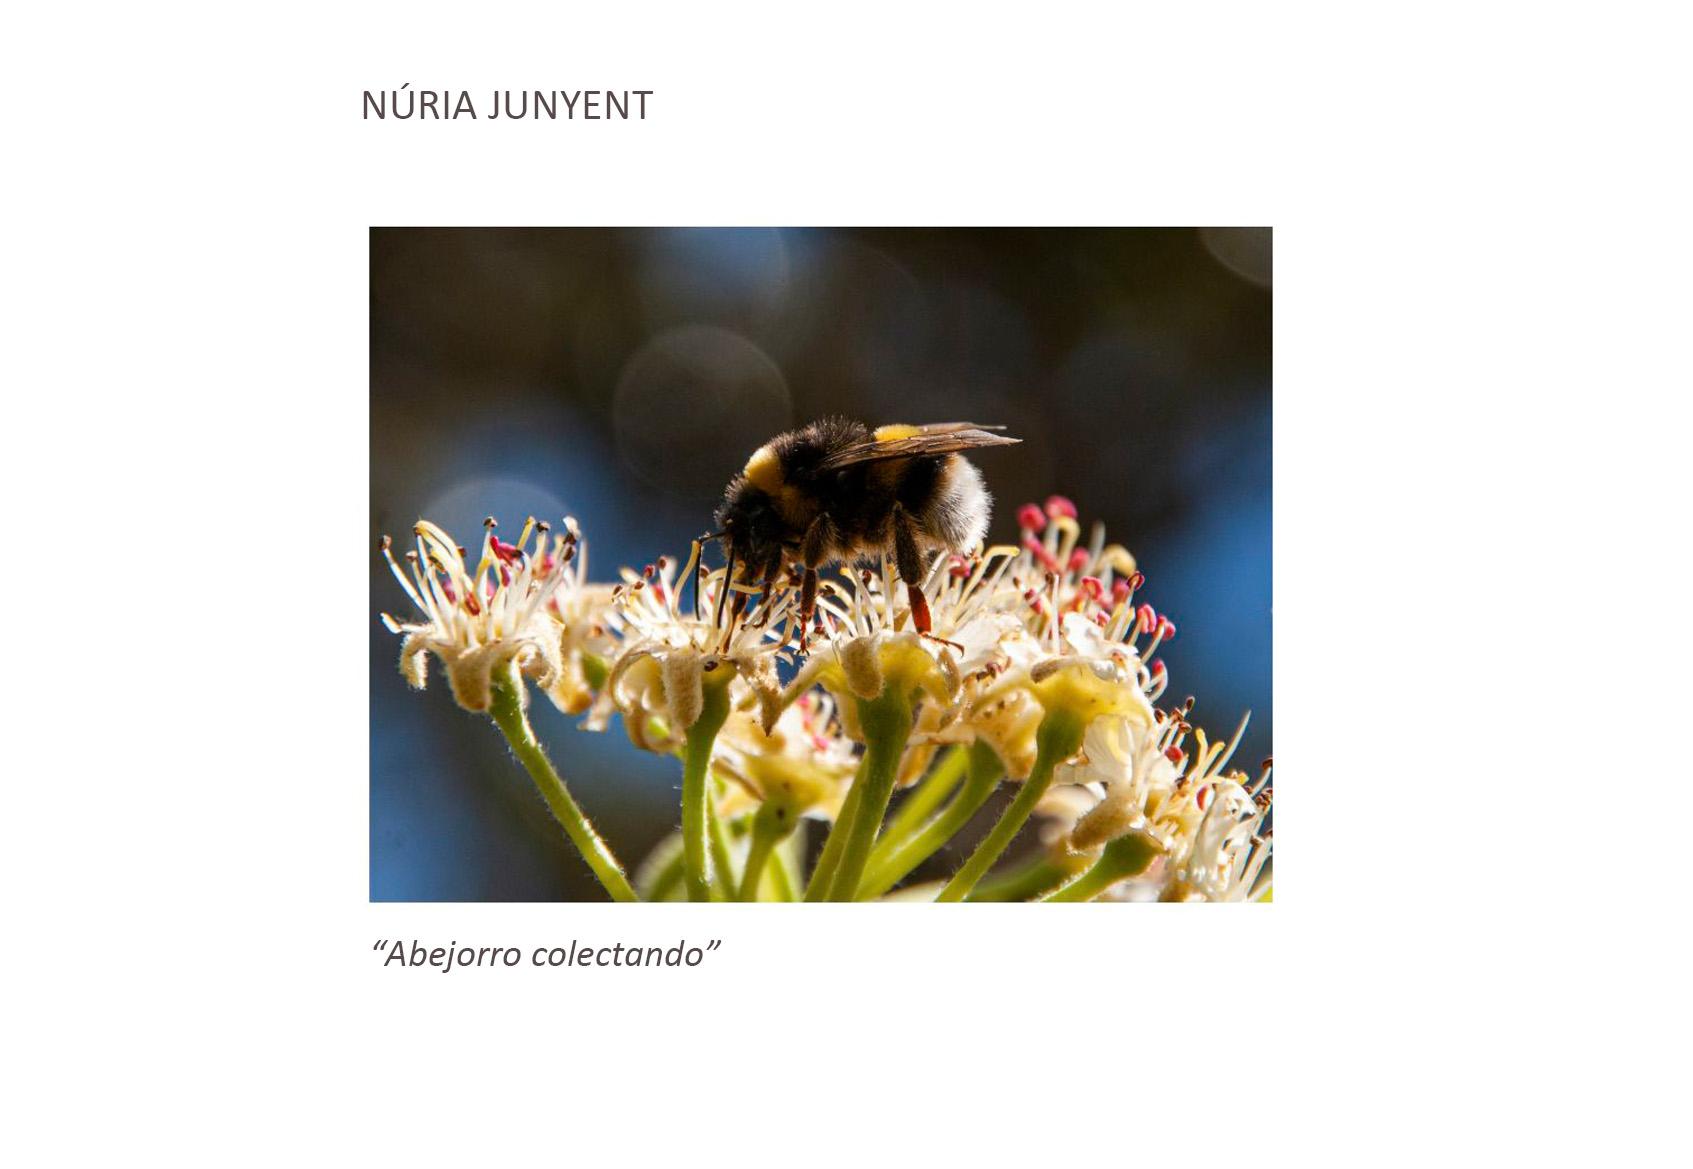 Núria_junyent